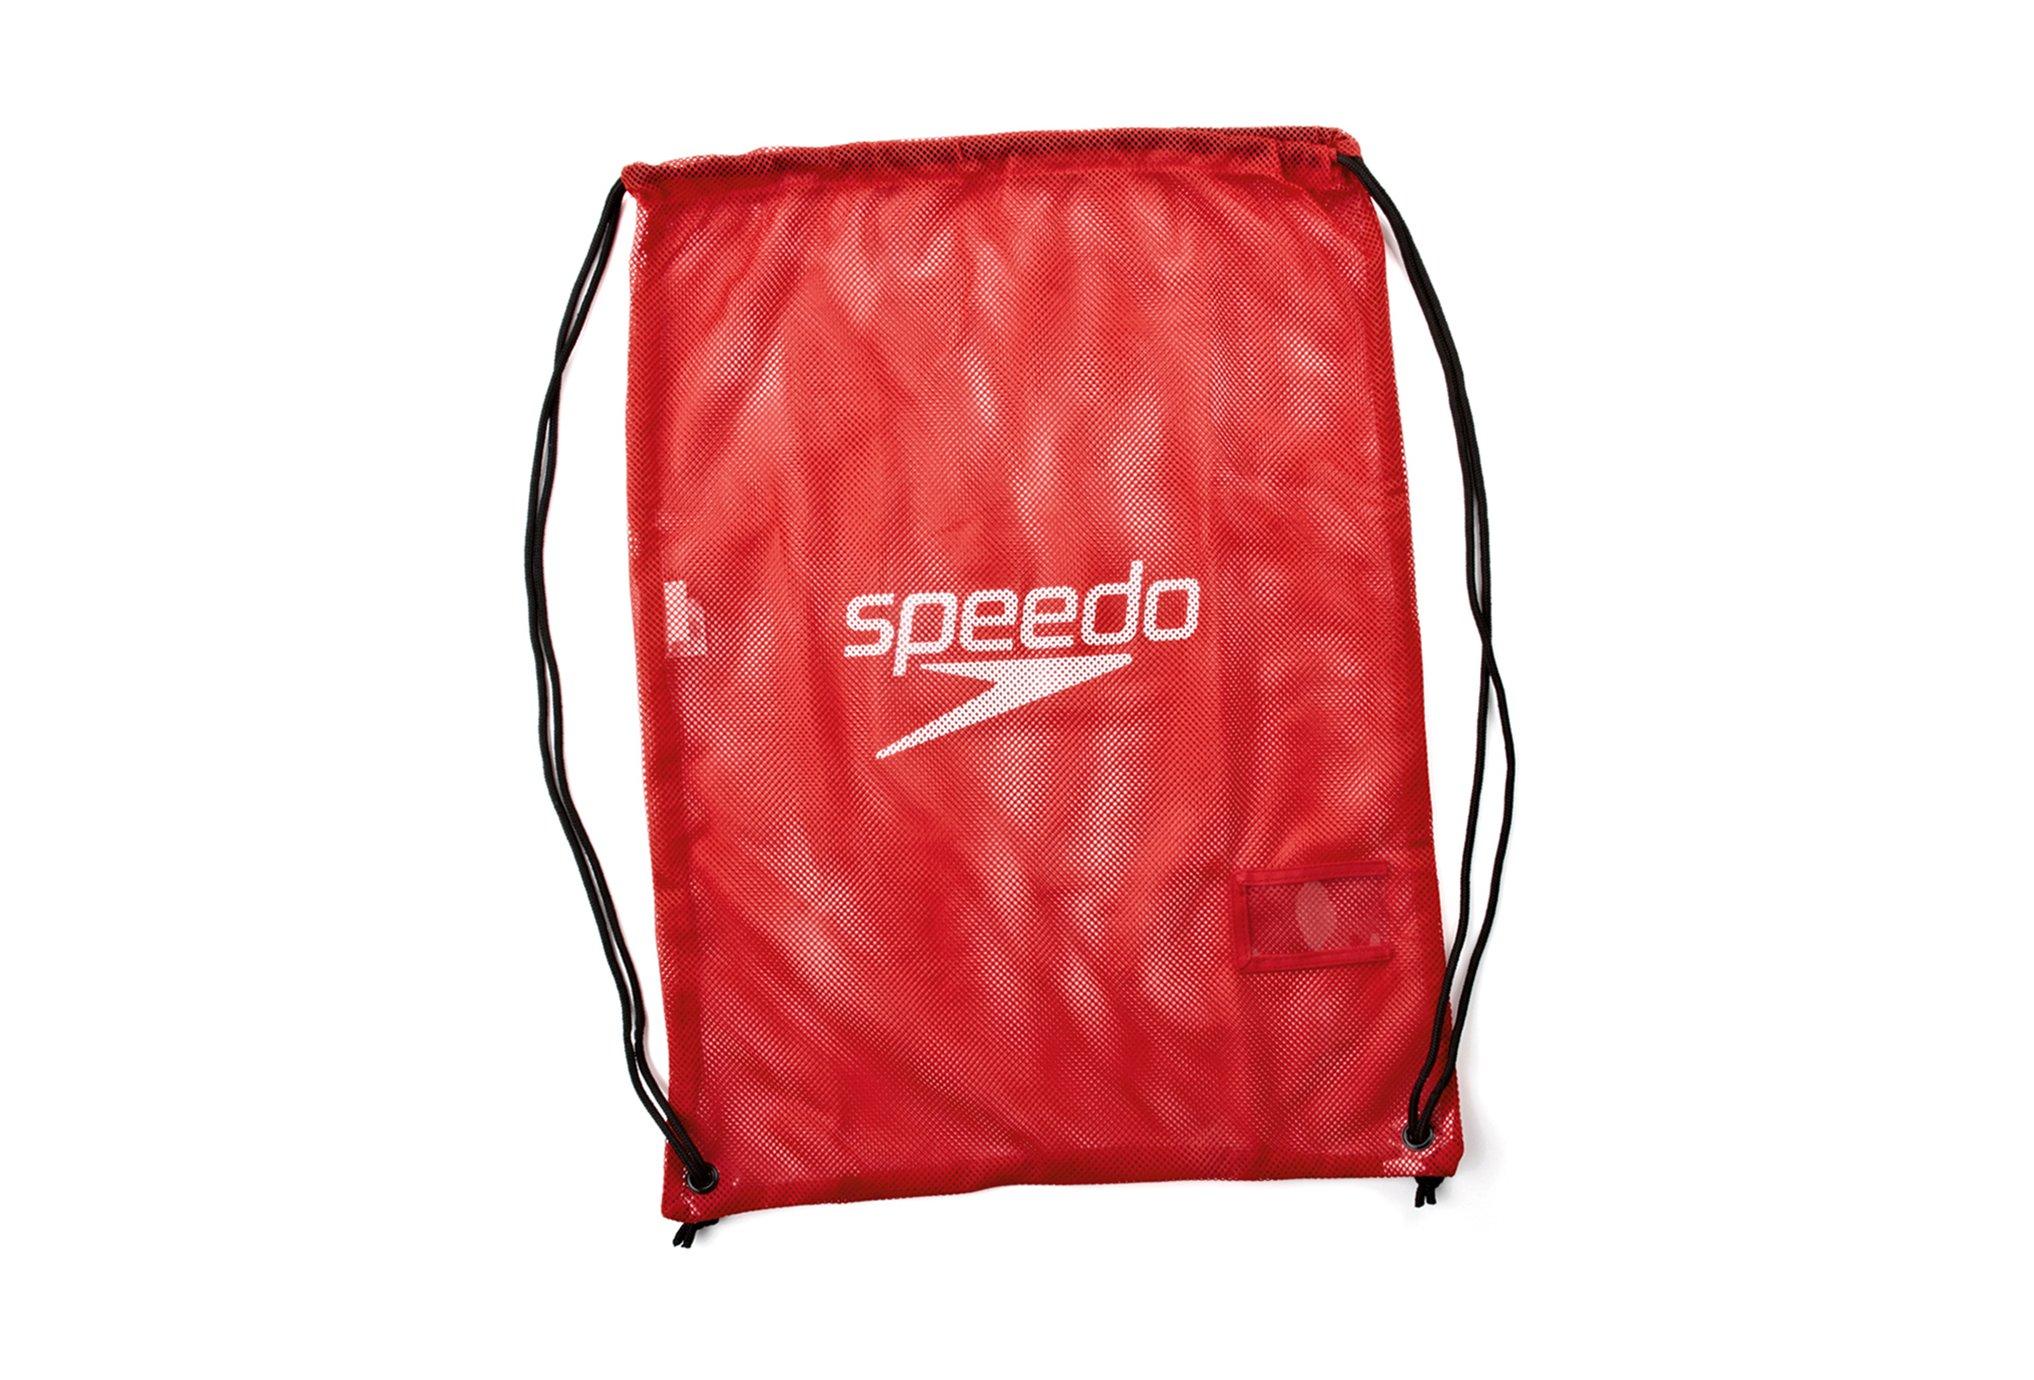 Speedo Equipment Mesh Triathlon-Natation